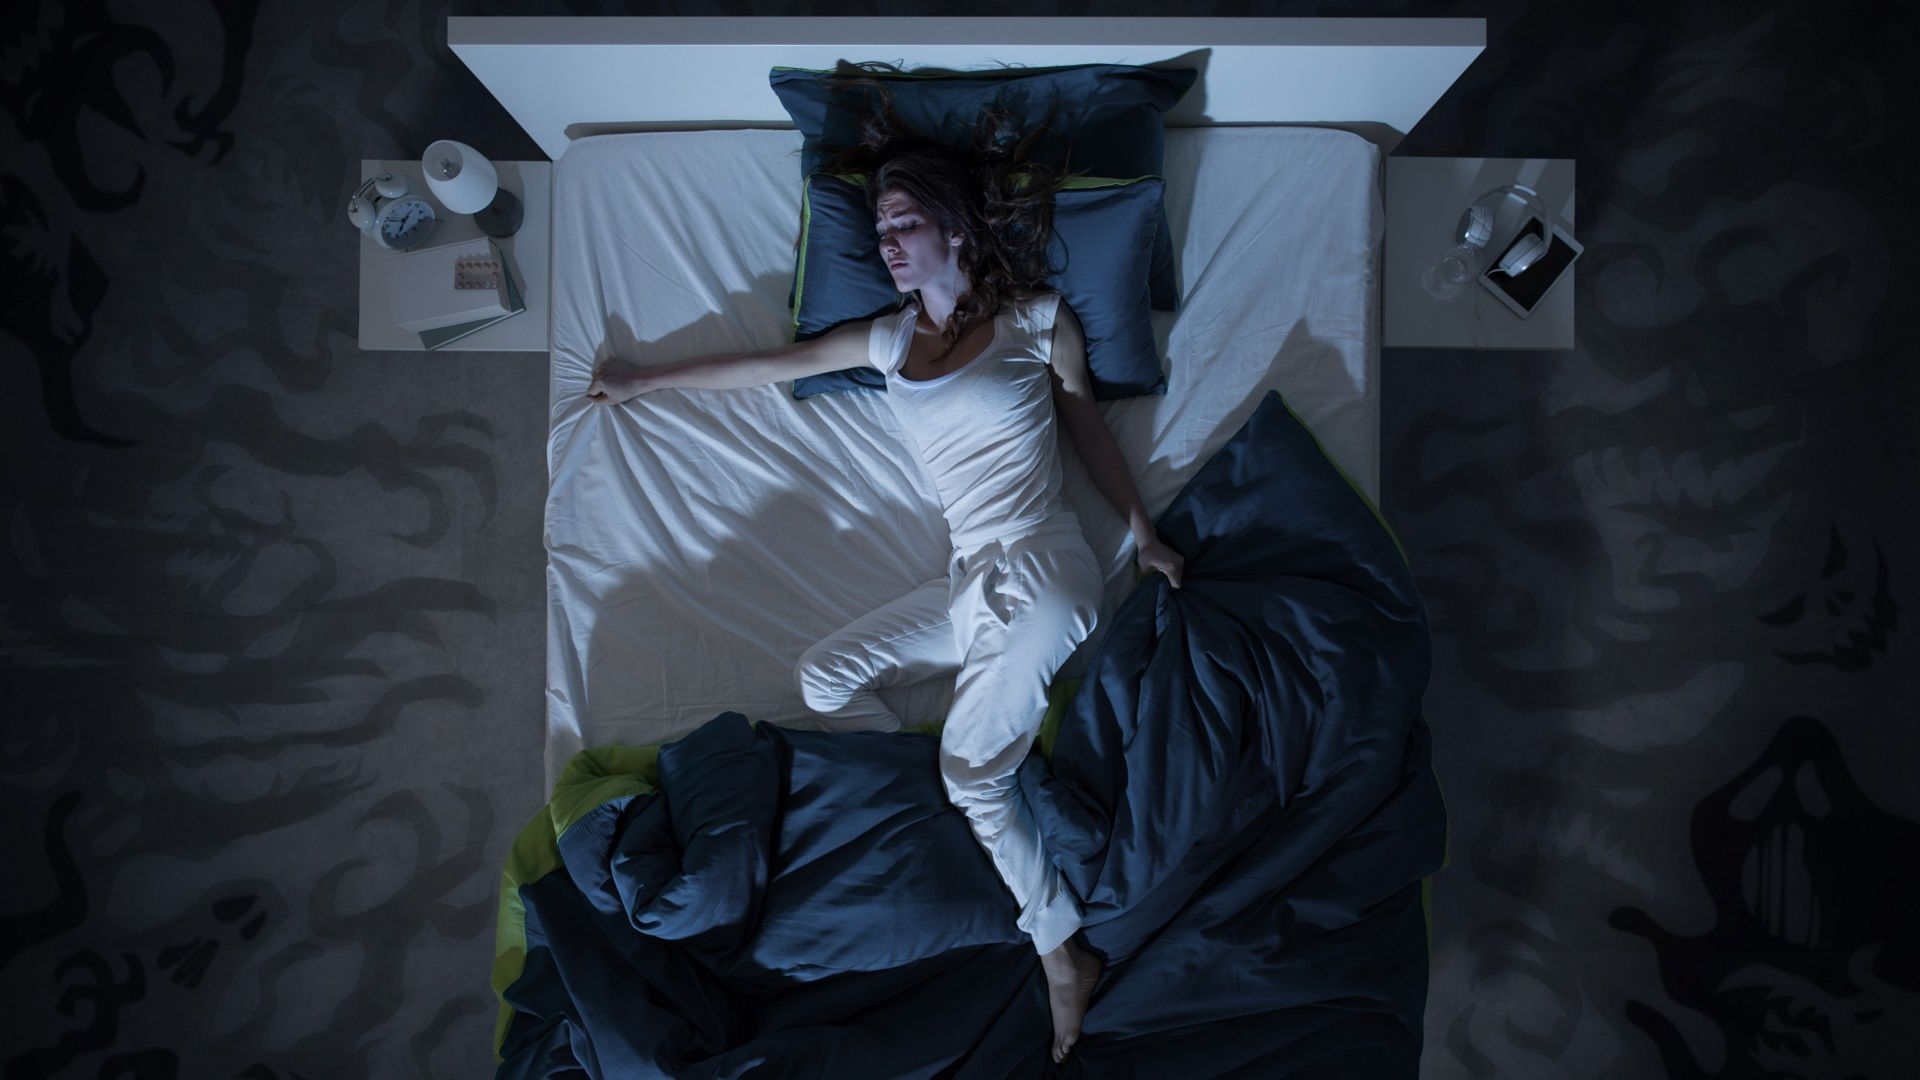 Minder zweten in bed